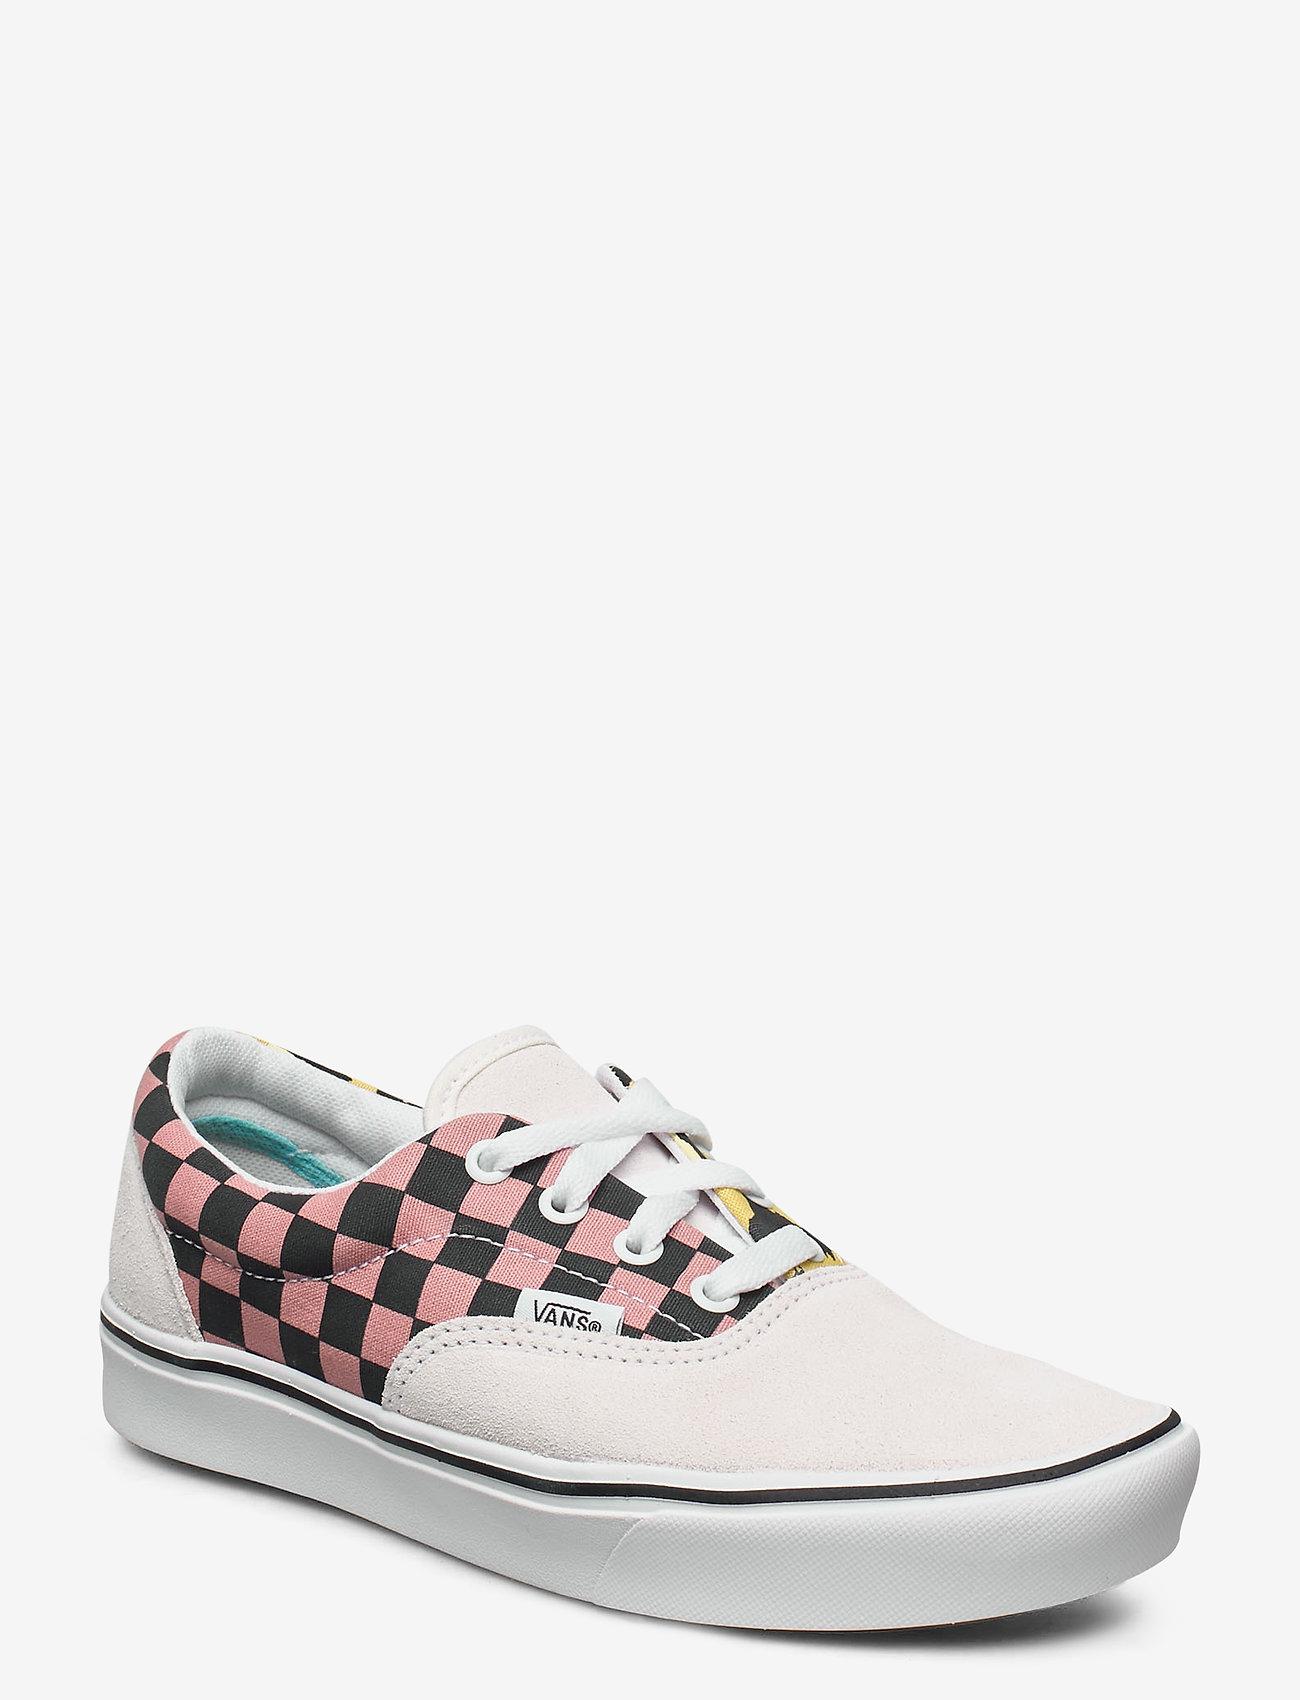 VANS - UA ComfyCush Era - lage sneakers - (mixed media) white/multi - 0